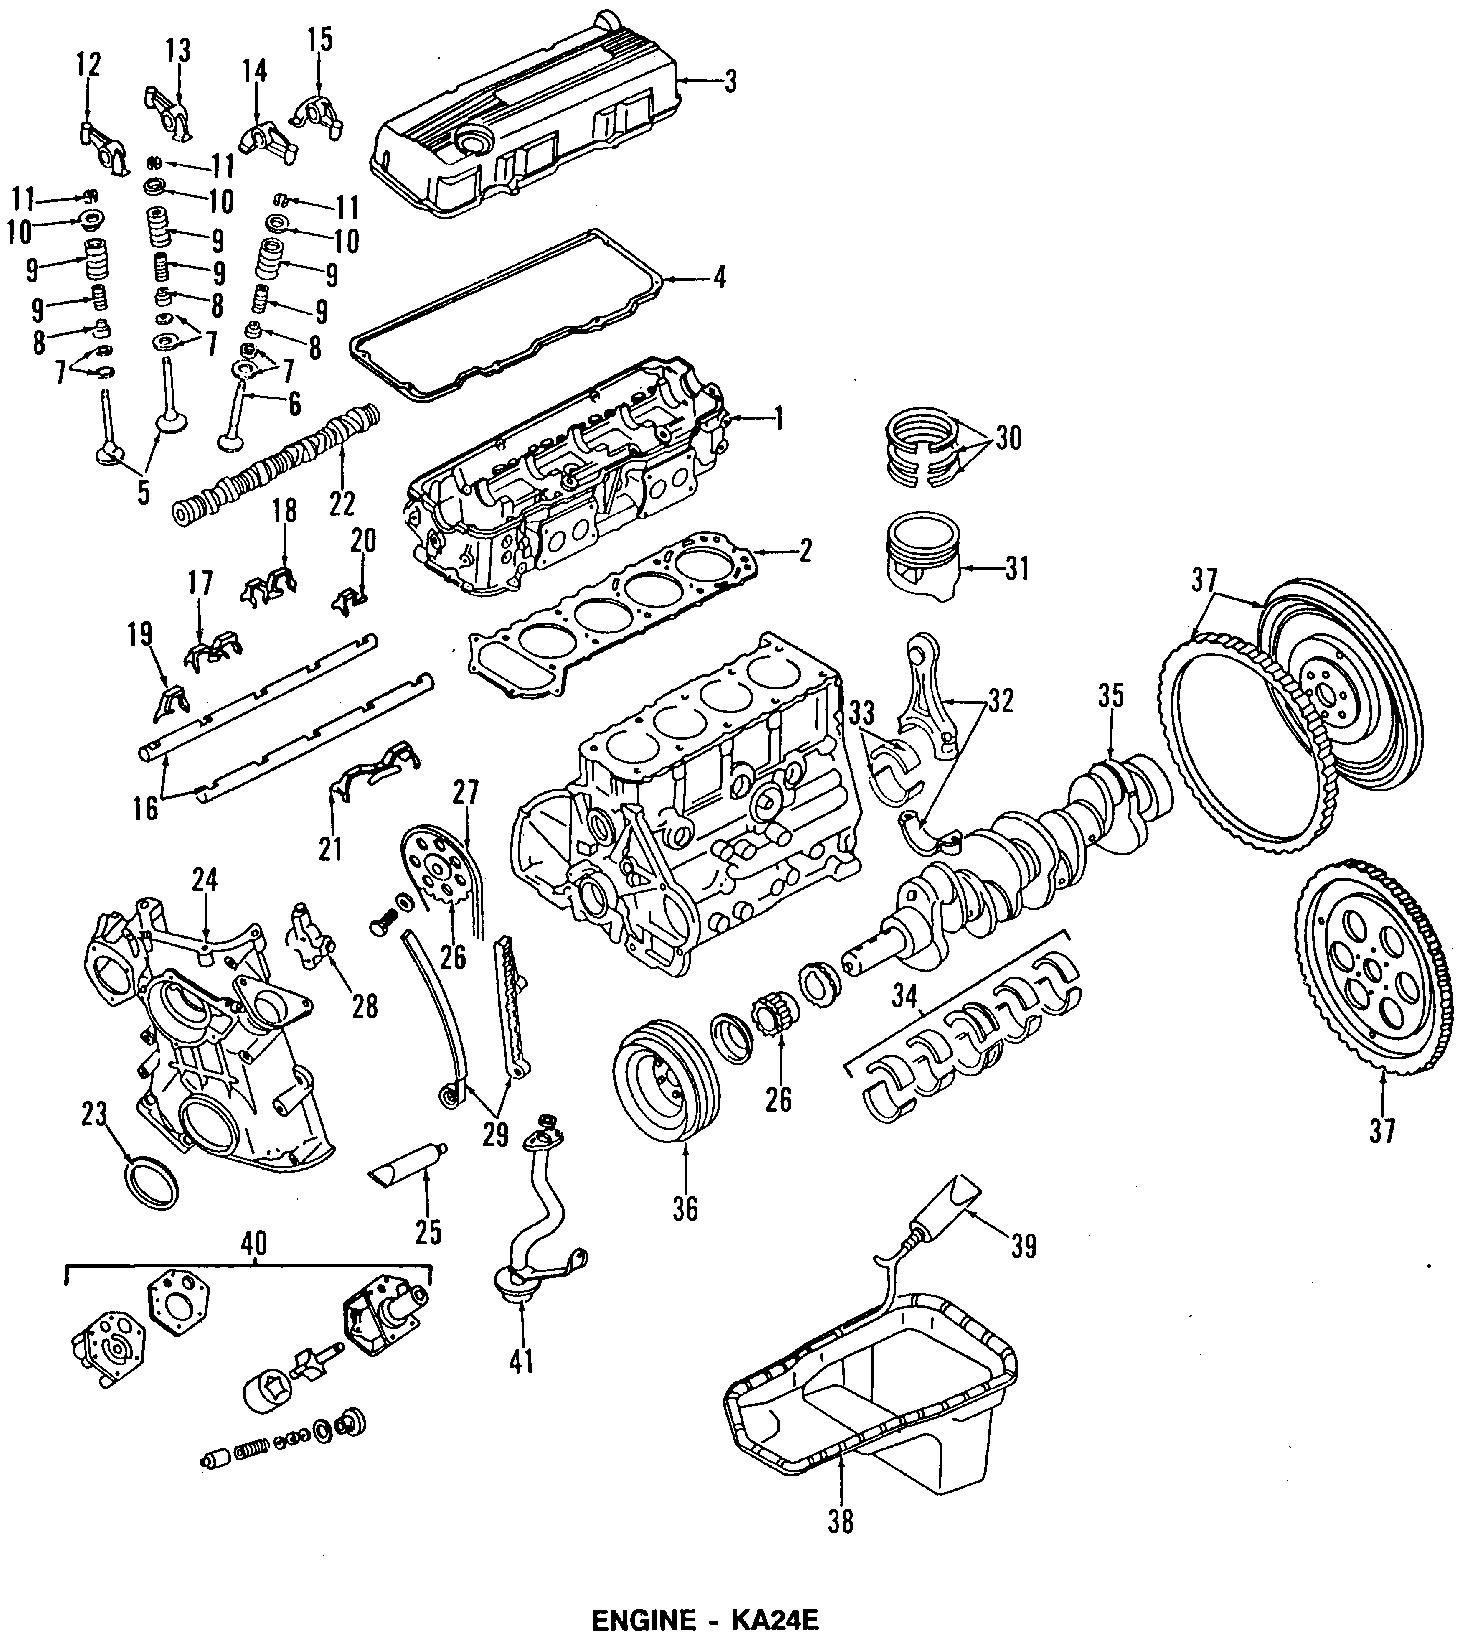 Nissan D21 Insulation Mount Front 4 Cylinder 2wd